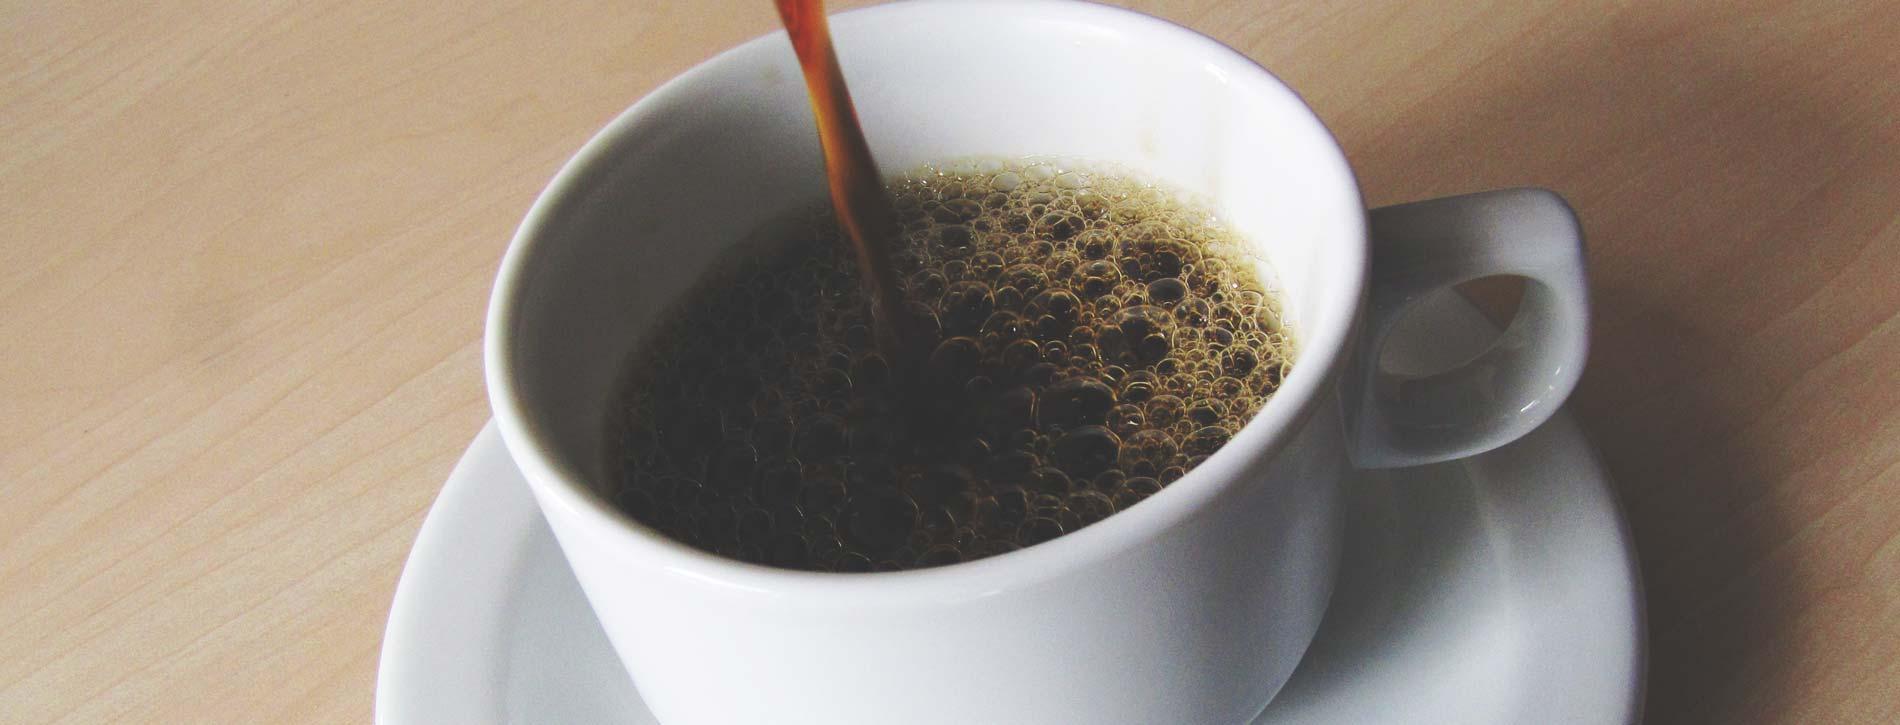 img_2483_coffe